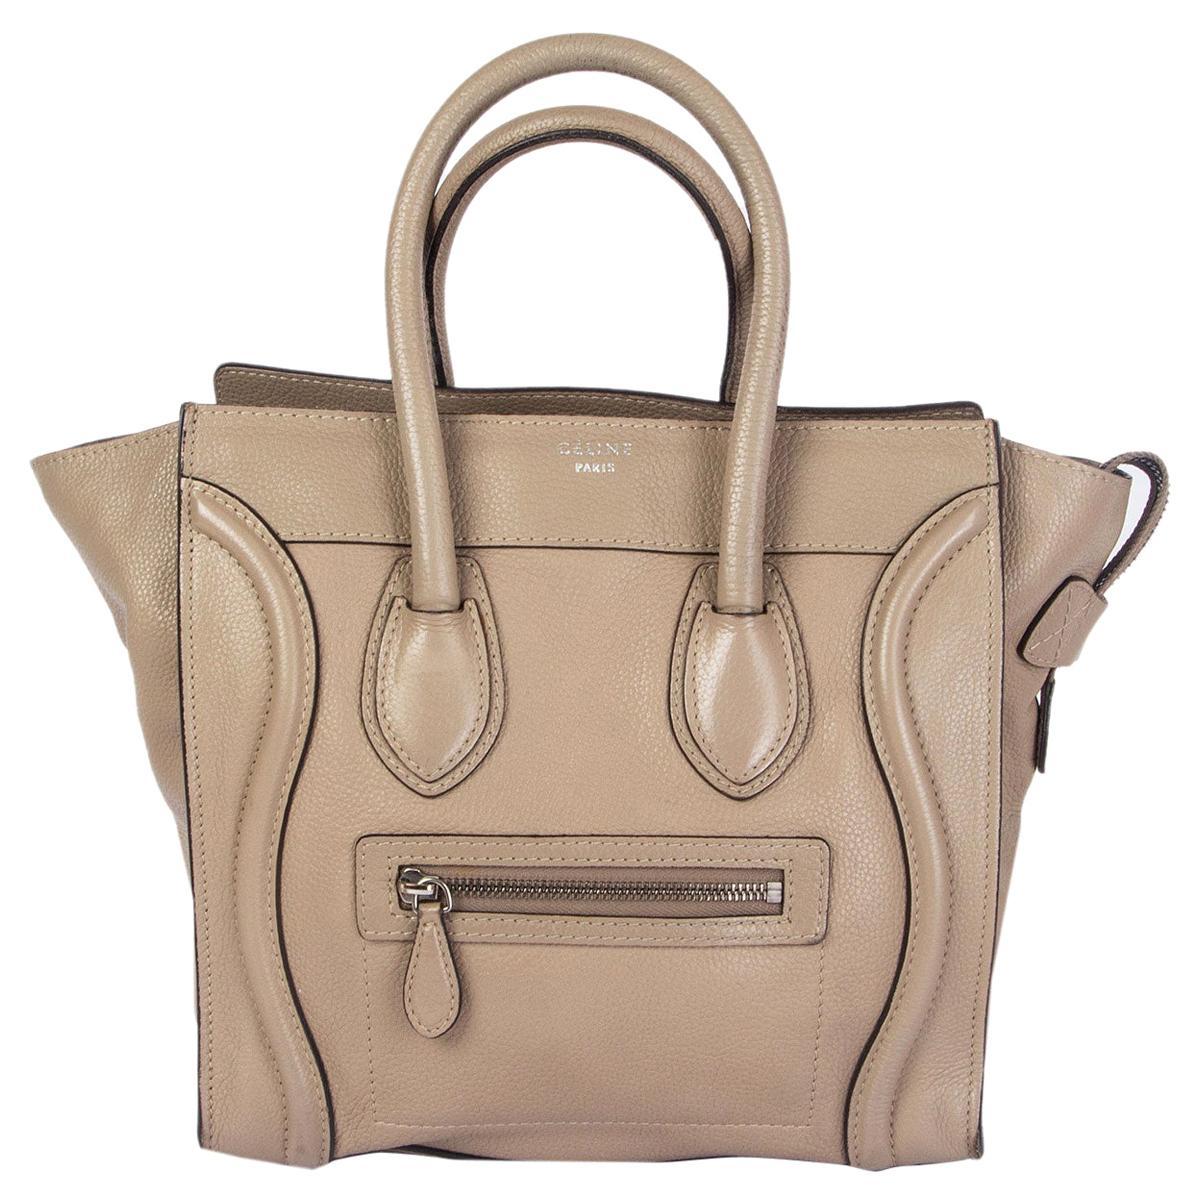 CELINE taupe leather DUNE MICRO LUGGAGE TOTE Bag